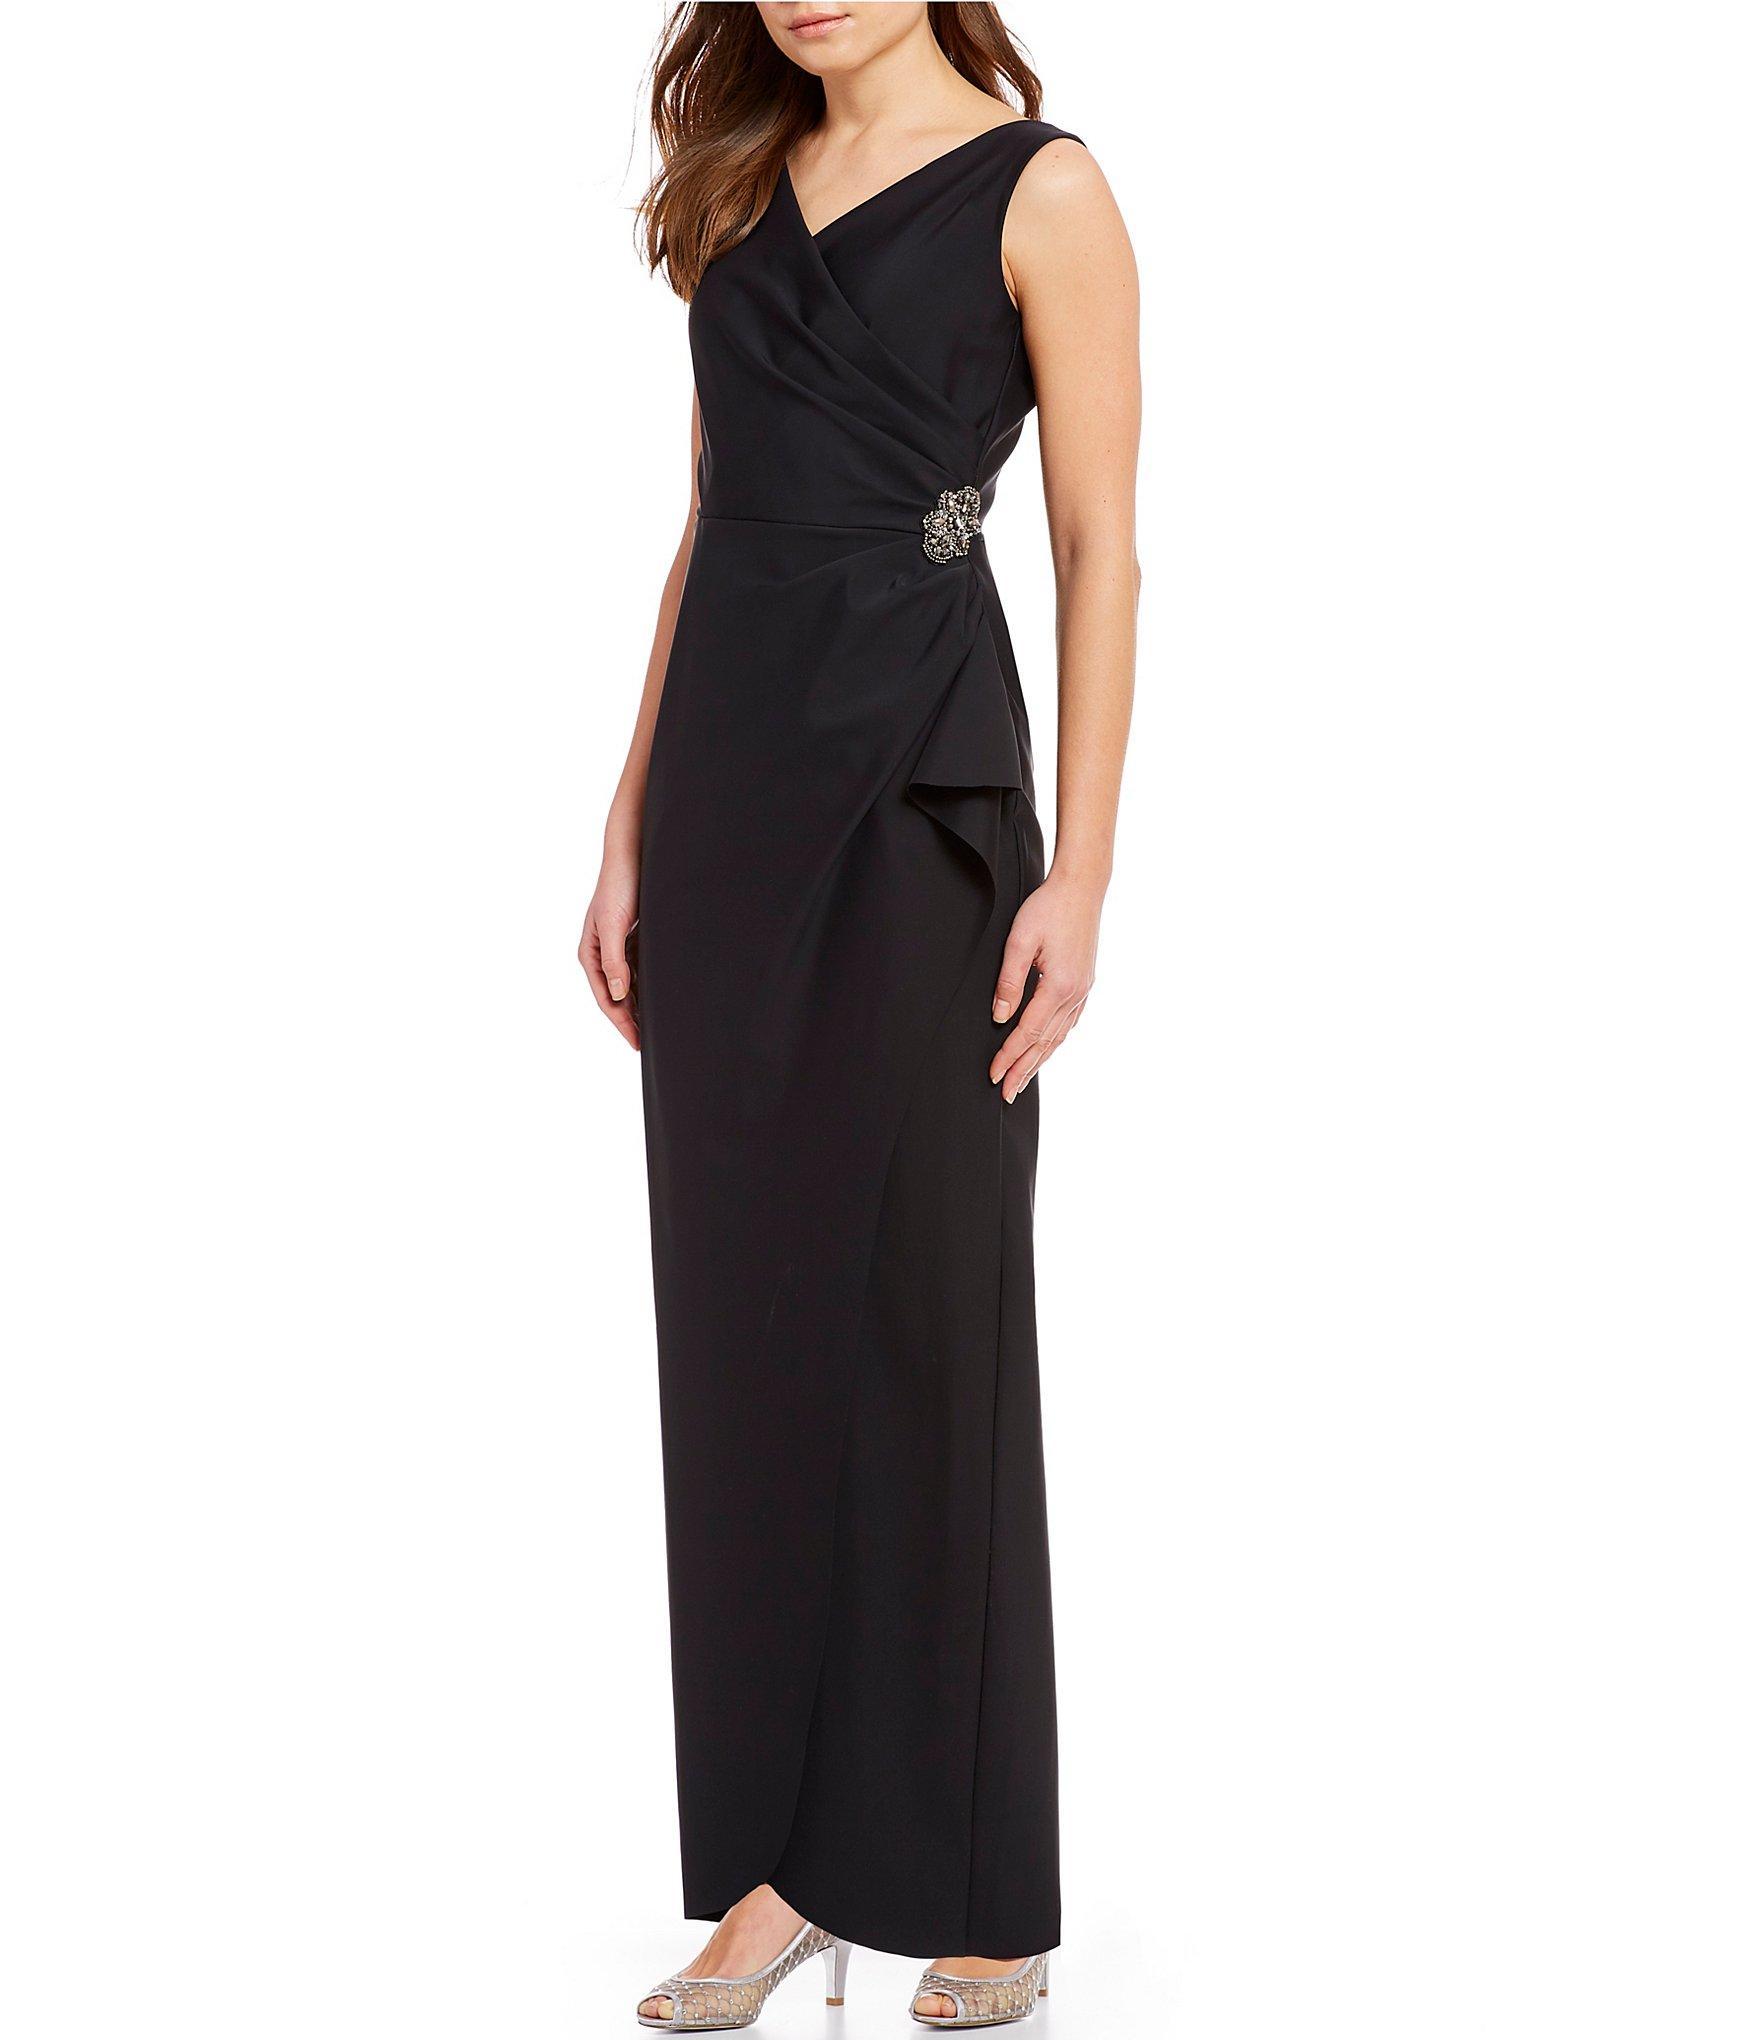 c8f8f7807f099 Alex Evenings. Women's Black Sleeveless Surplice Neckline Beaded Detail  Sheath Dress